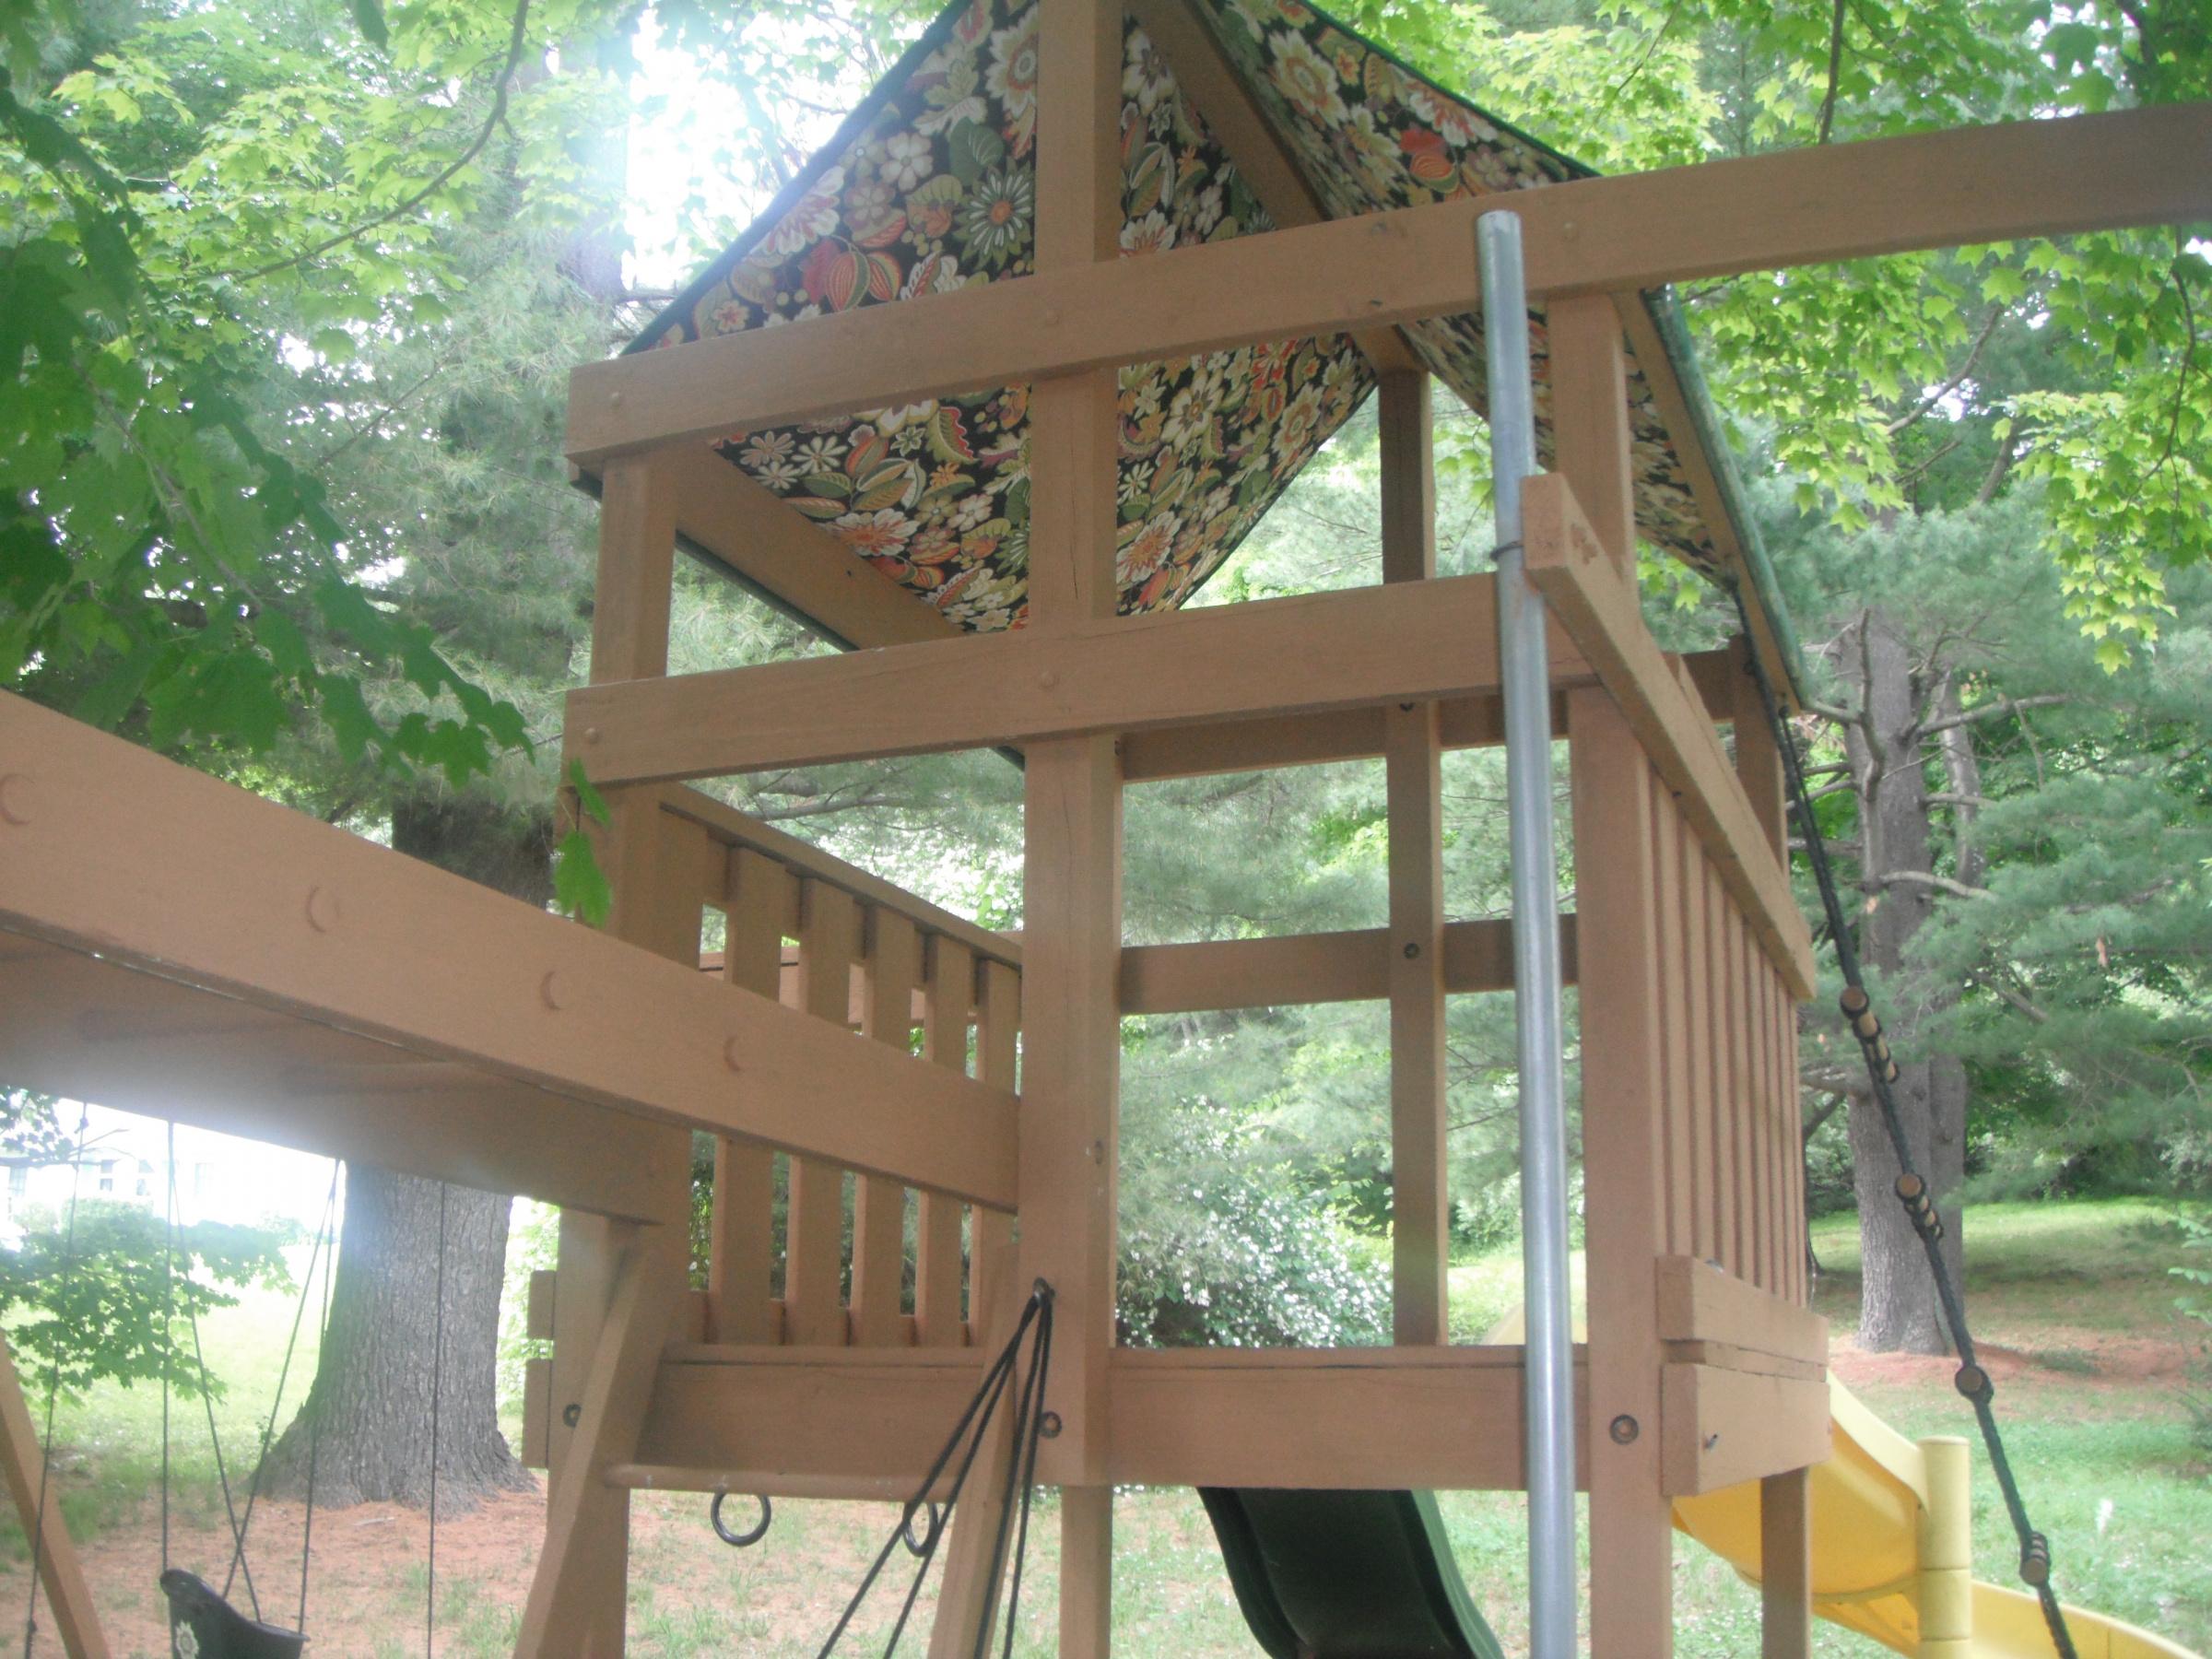 Project Playground-dscf0140.jpg